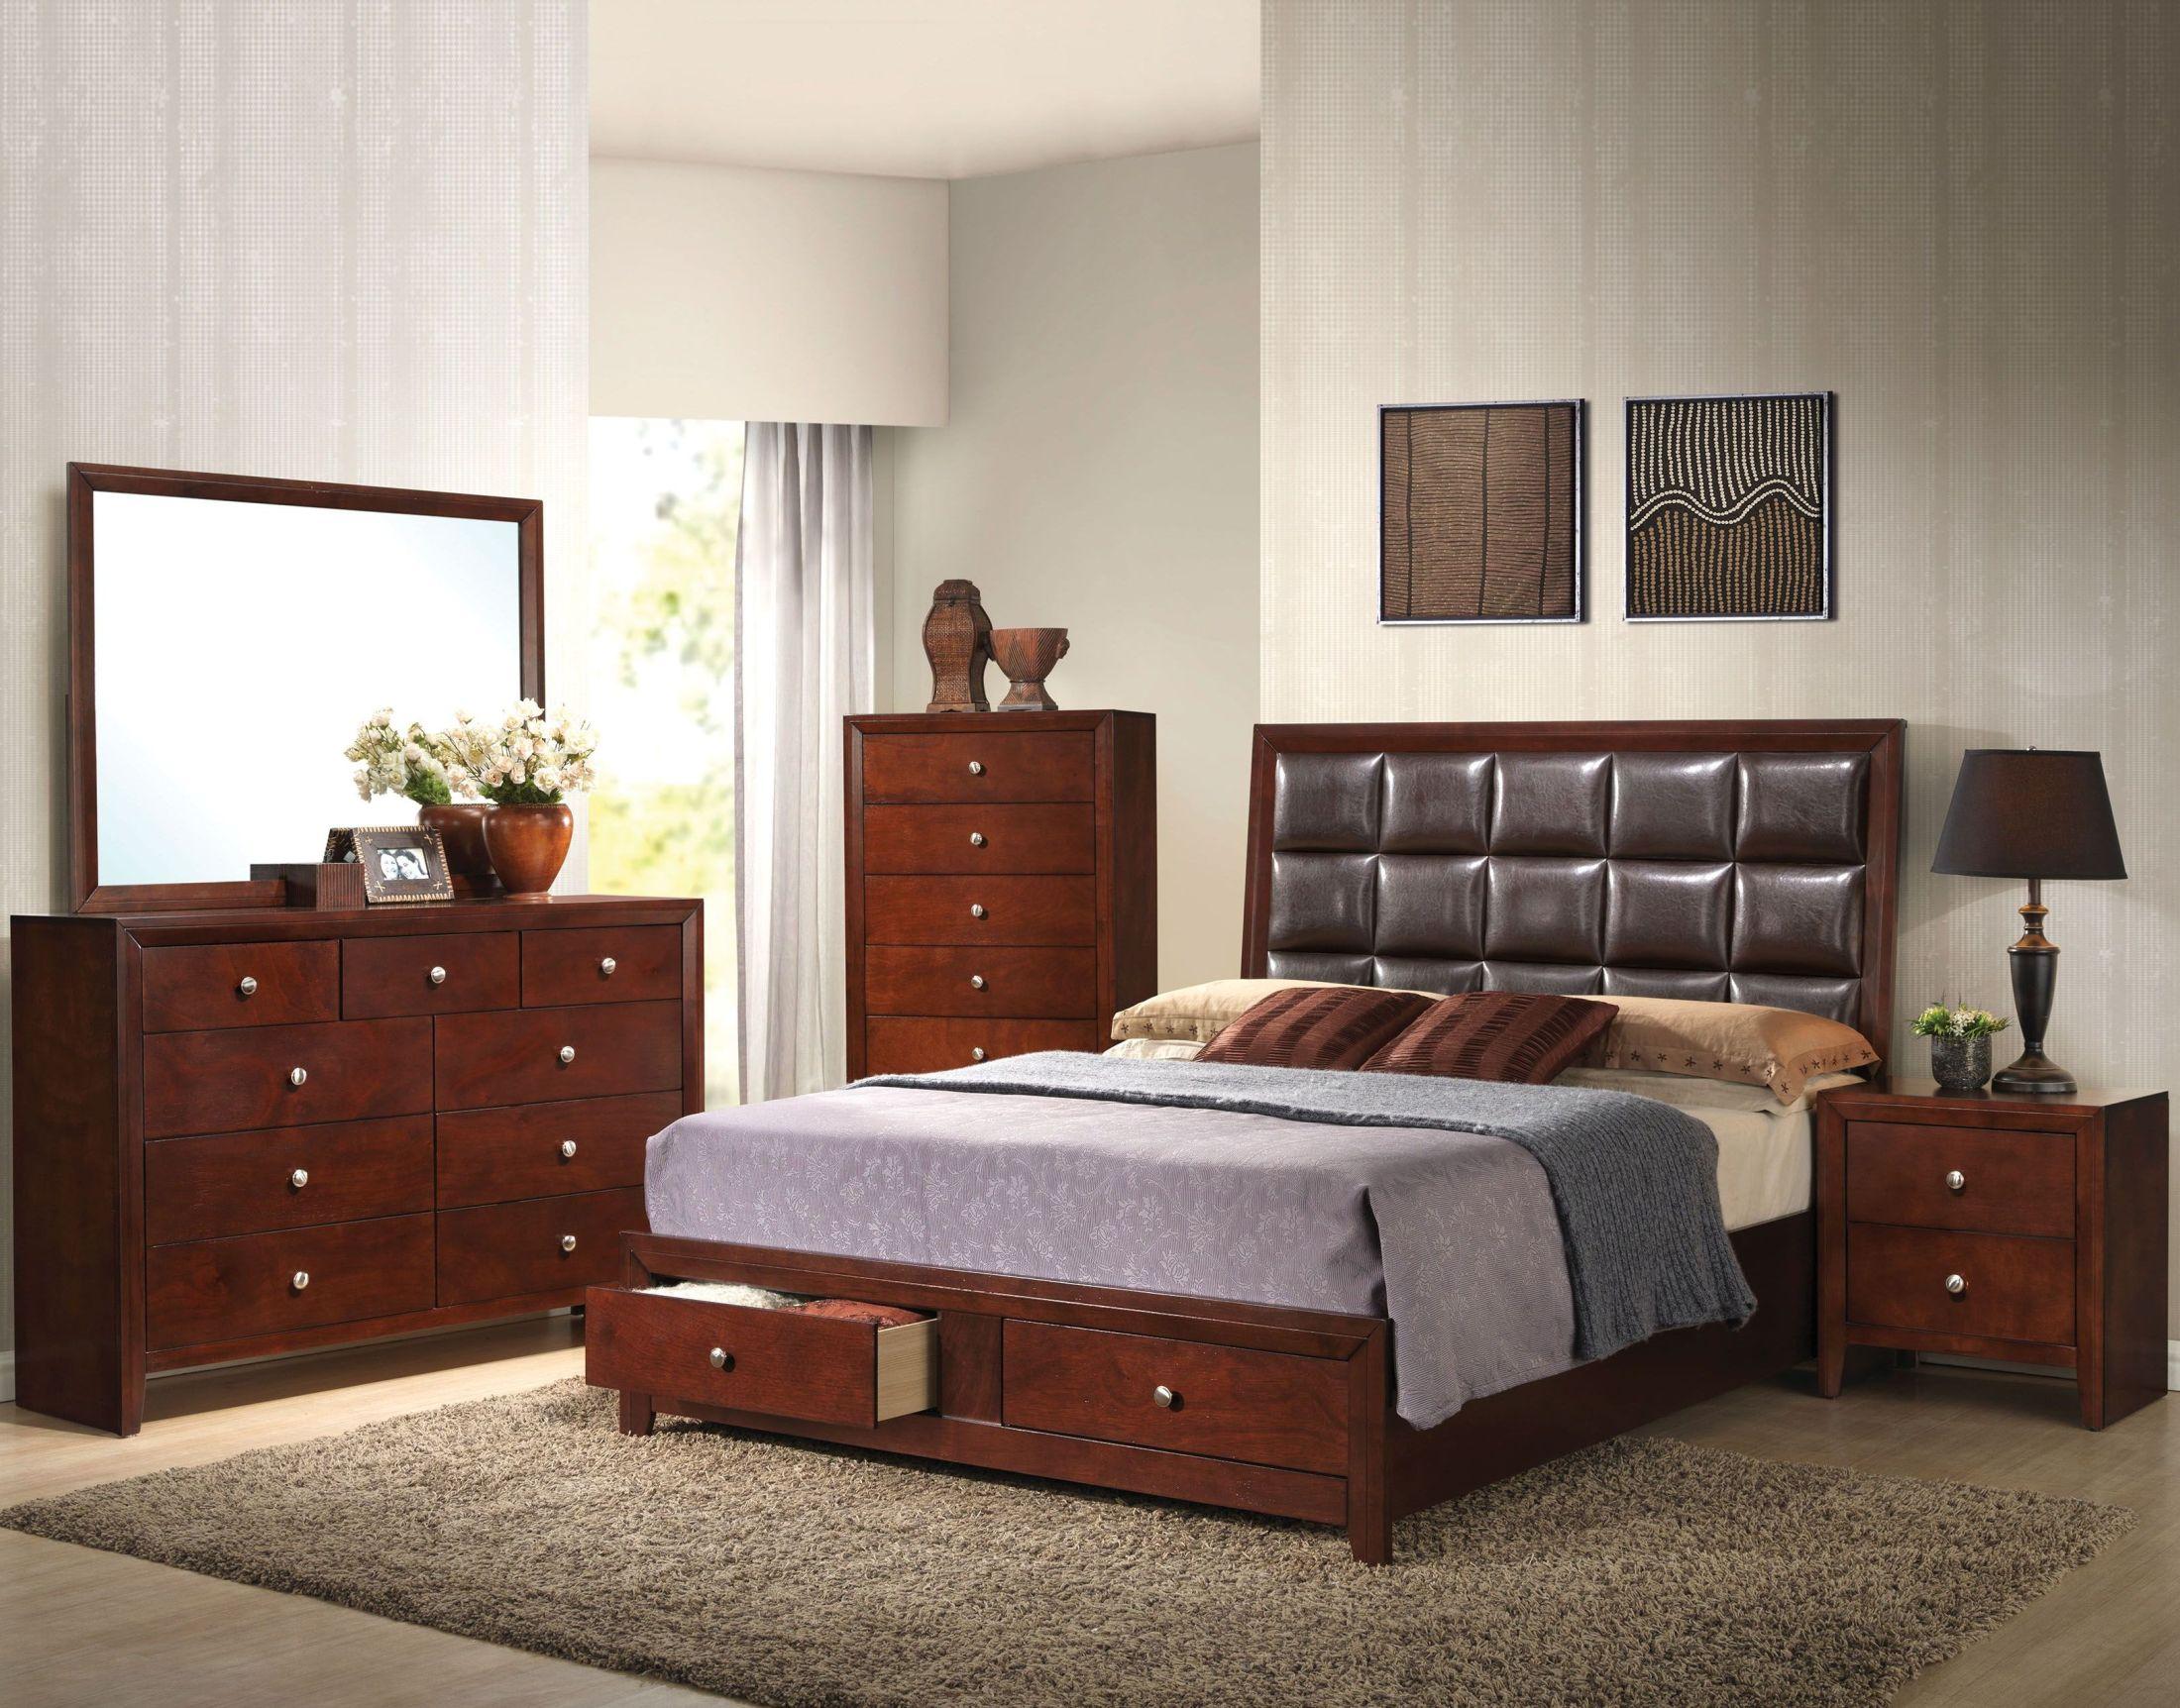 Furniture Goleta 5 Piece Modern Black Bedroom Set W Queen Bed Dresser Mirror Nightstands Home Garden Mbln Org